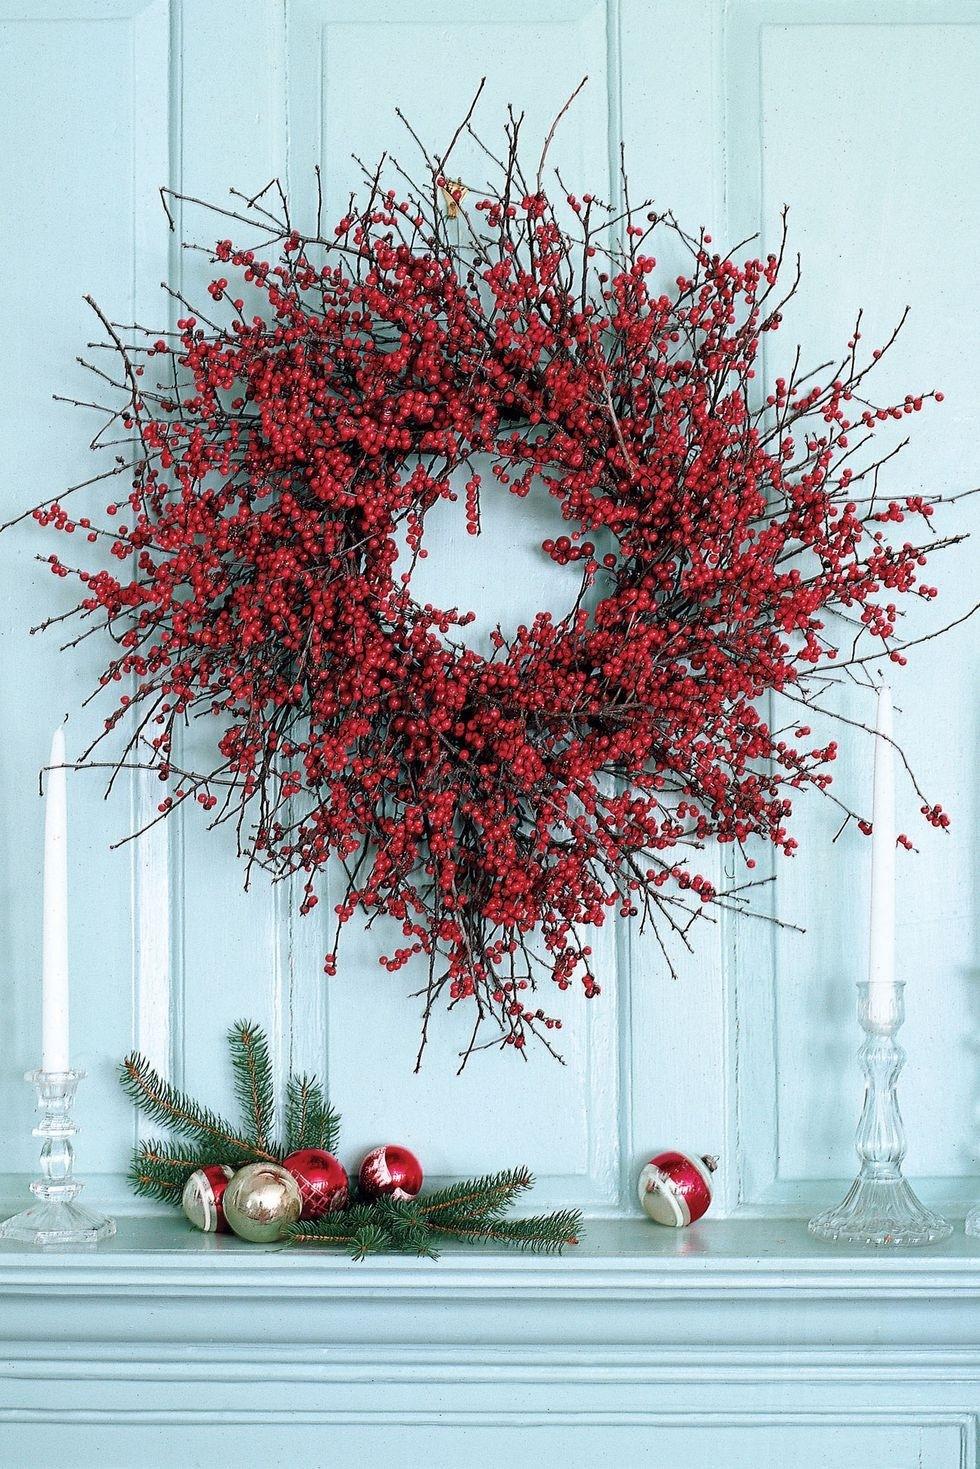 Berry wreaths front door 5 & Berry Wreaths Front Door - Foter